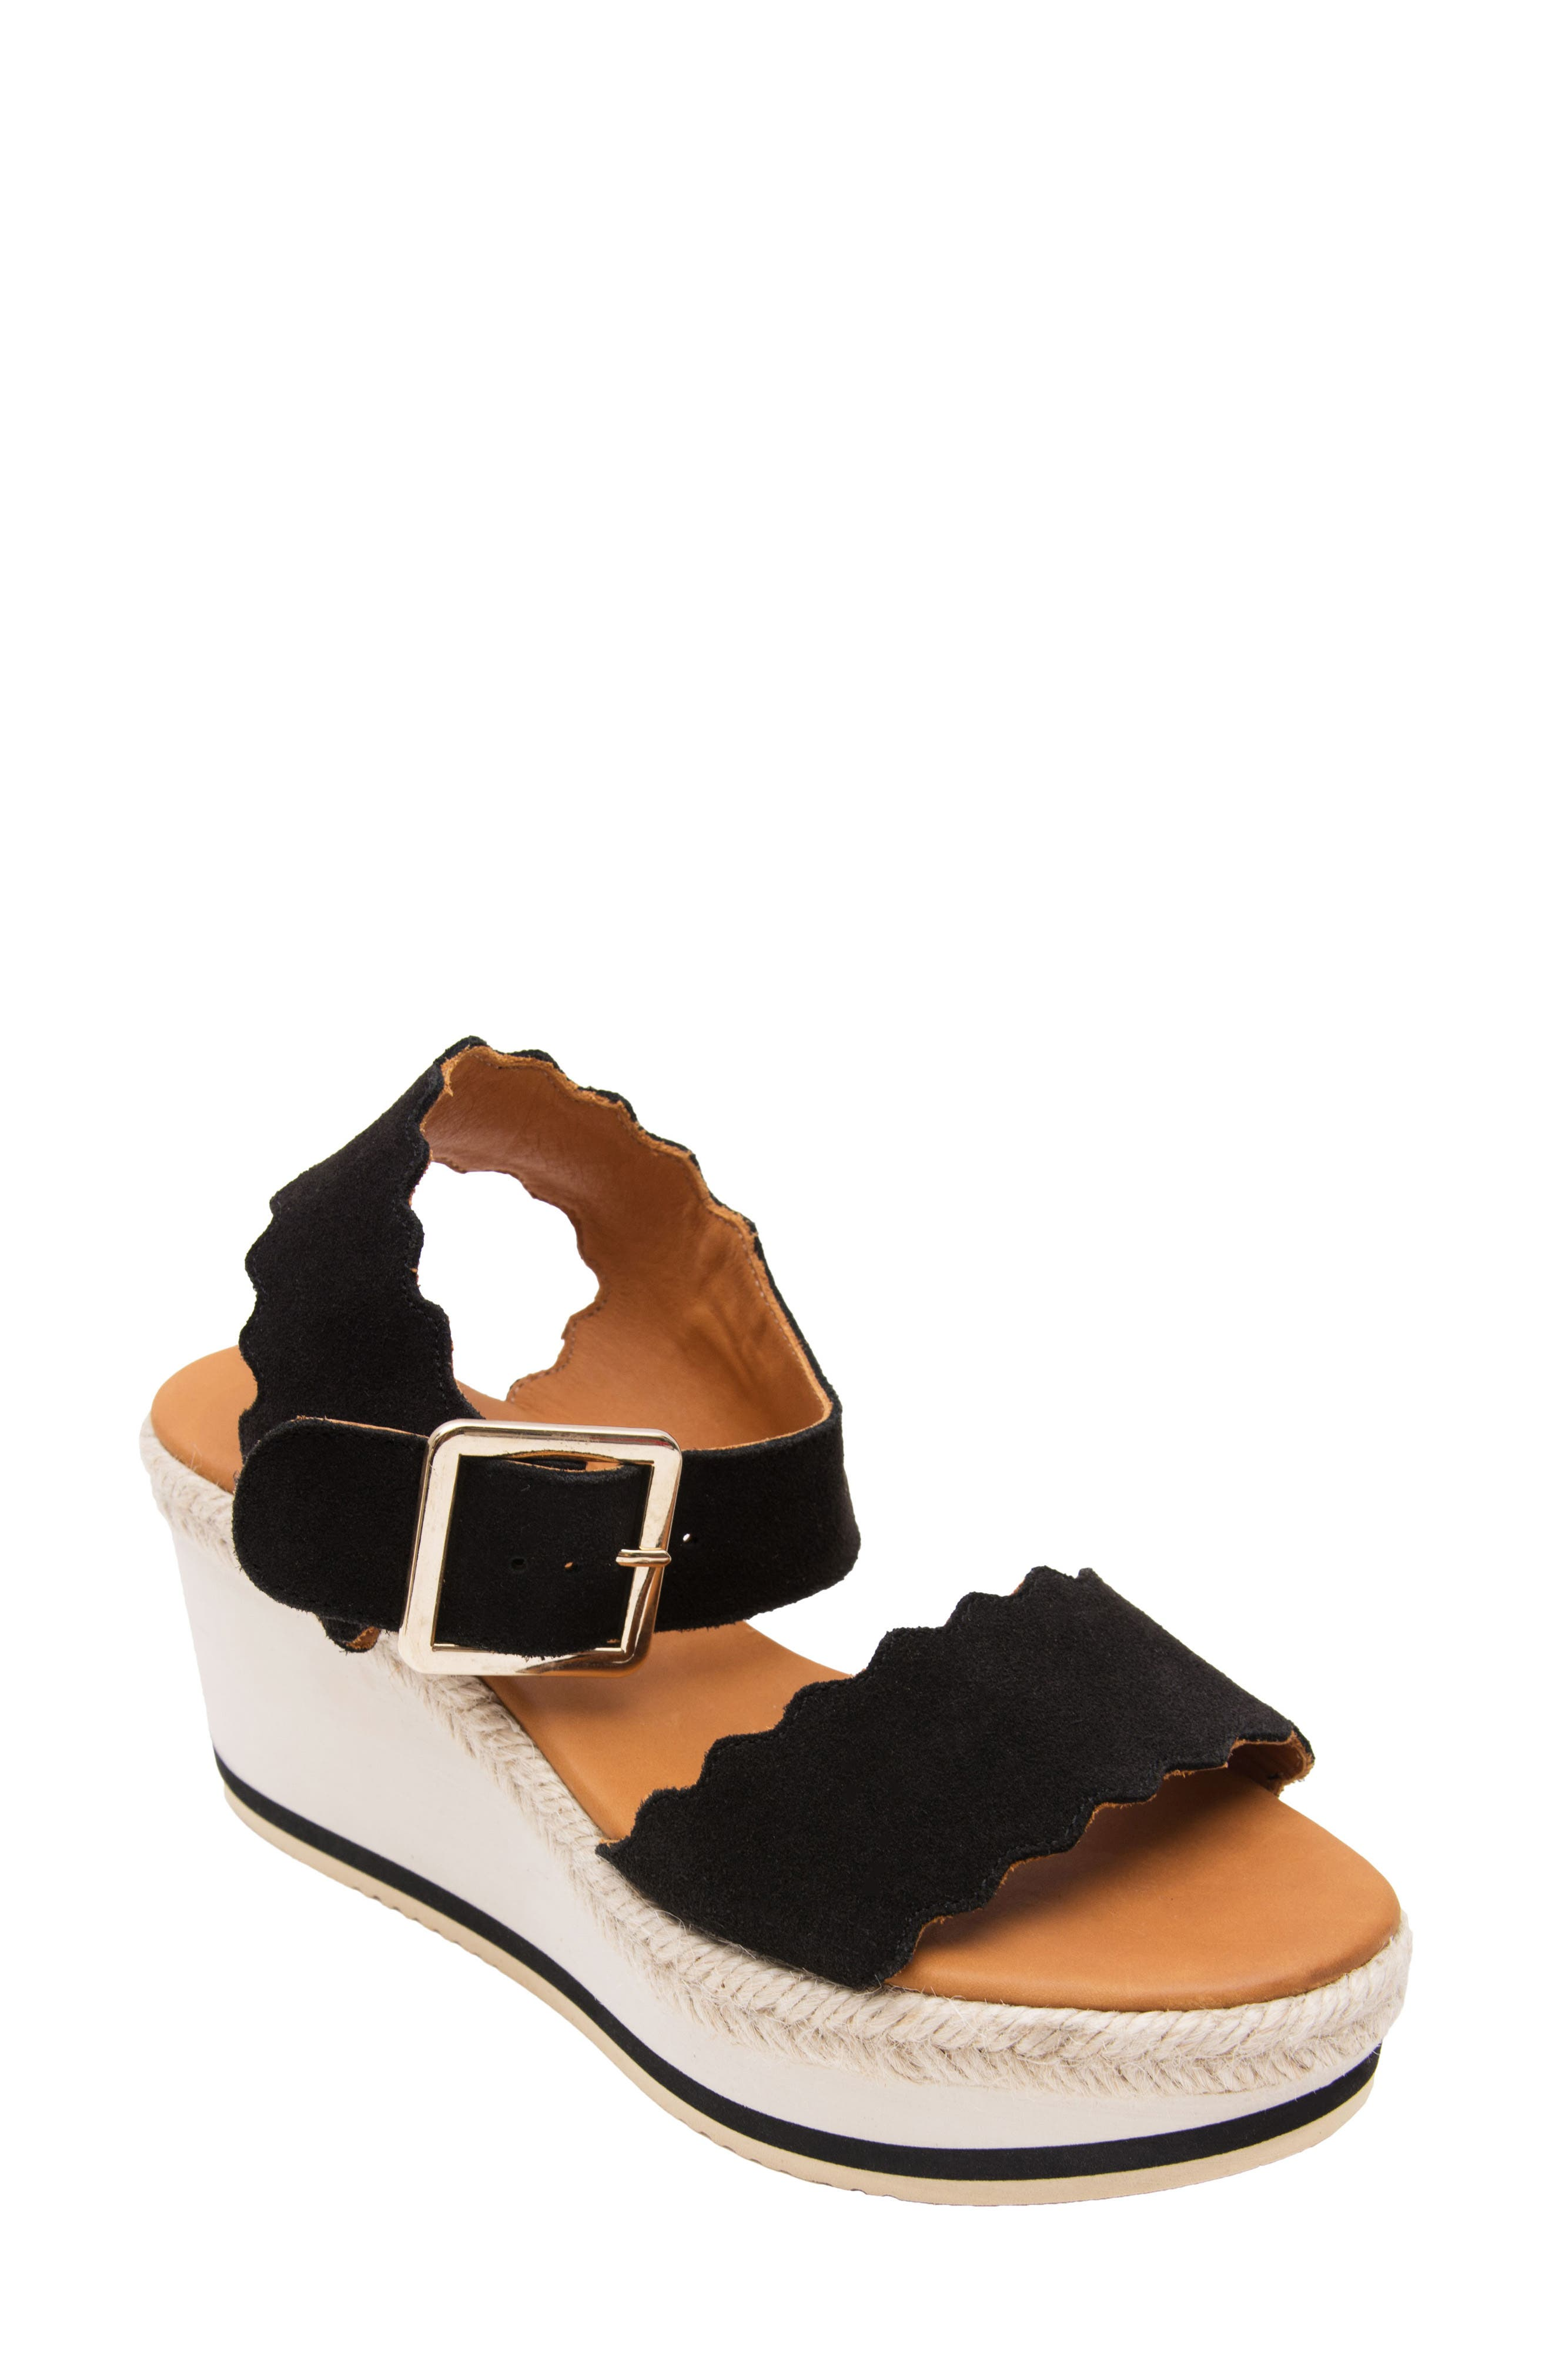 Carla Espadrille Wedge Platform Sandal